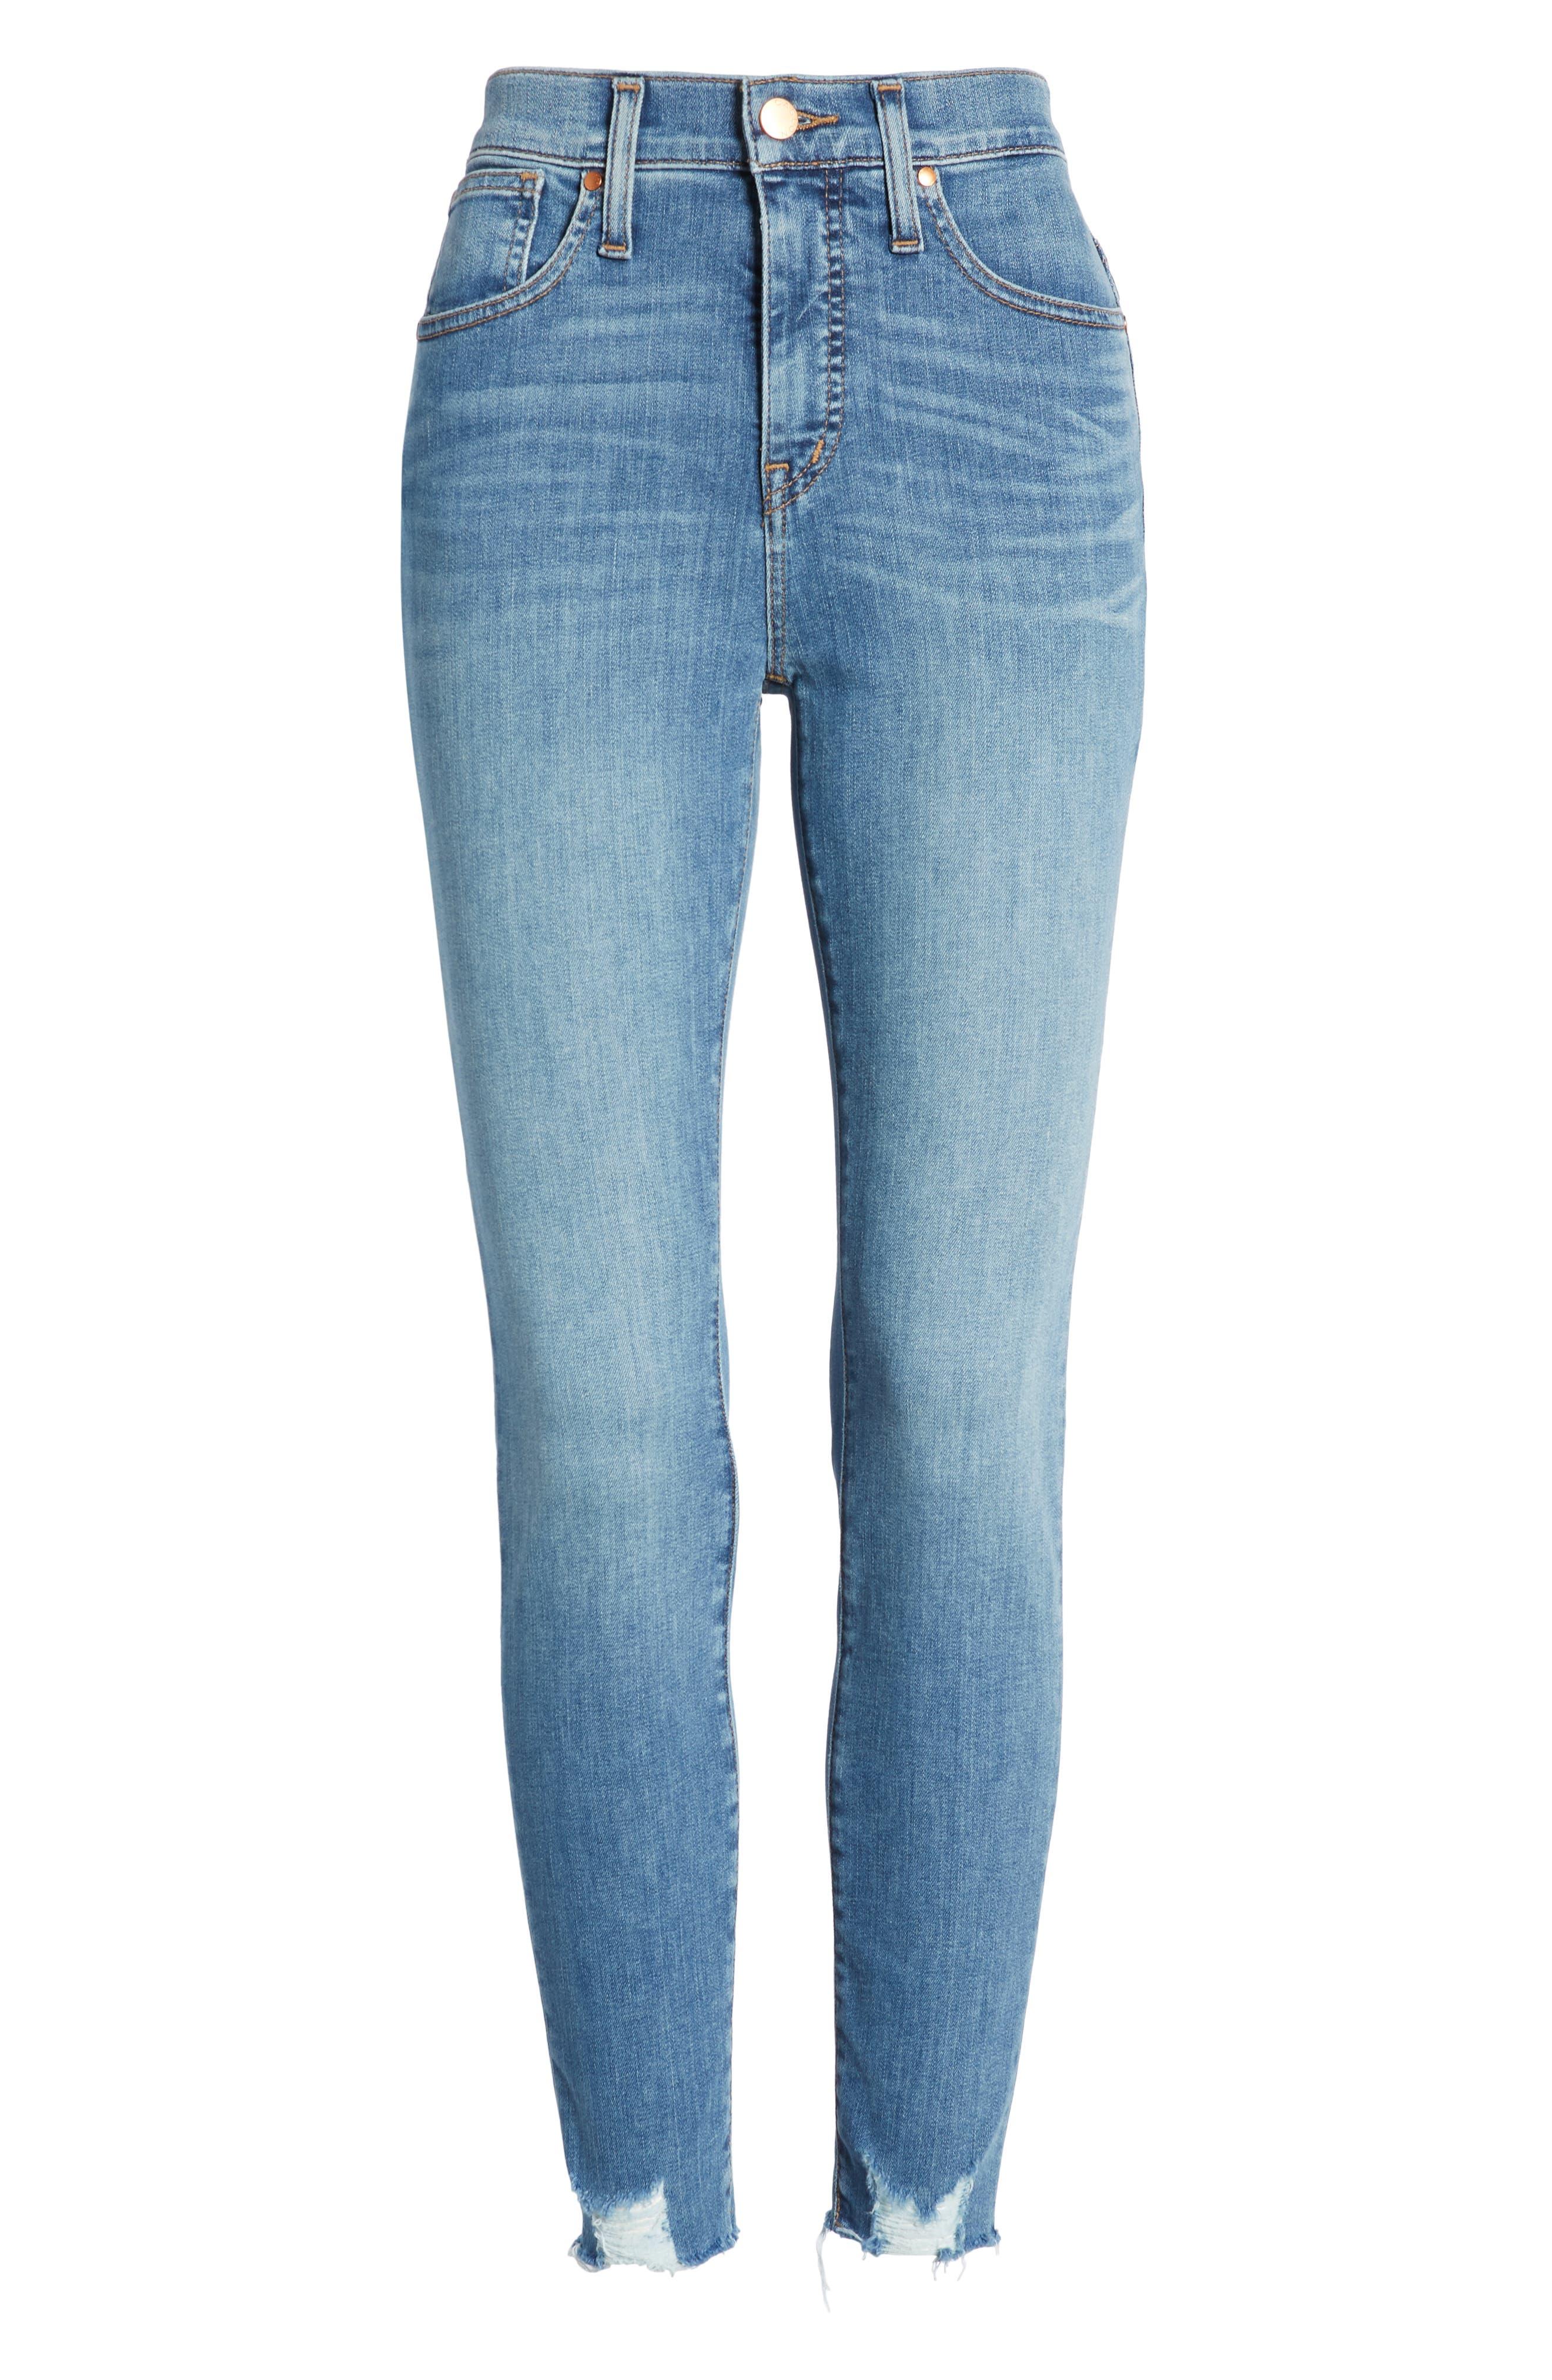 Sierra High Waist Raw Hem Skinny Jeans,                             Alternate thumbnail 7, color,                             NORIKO